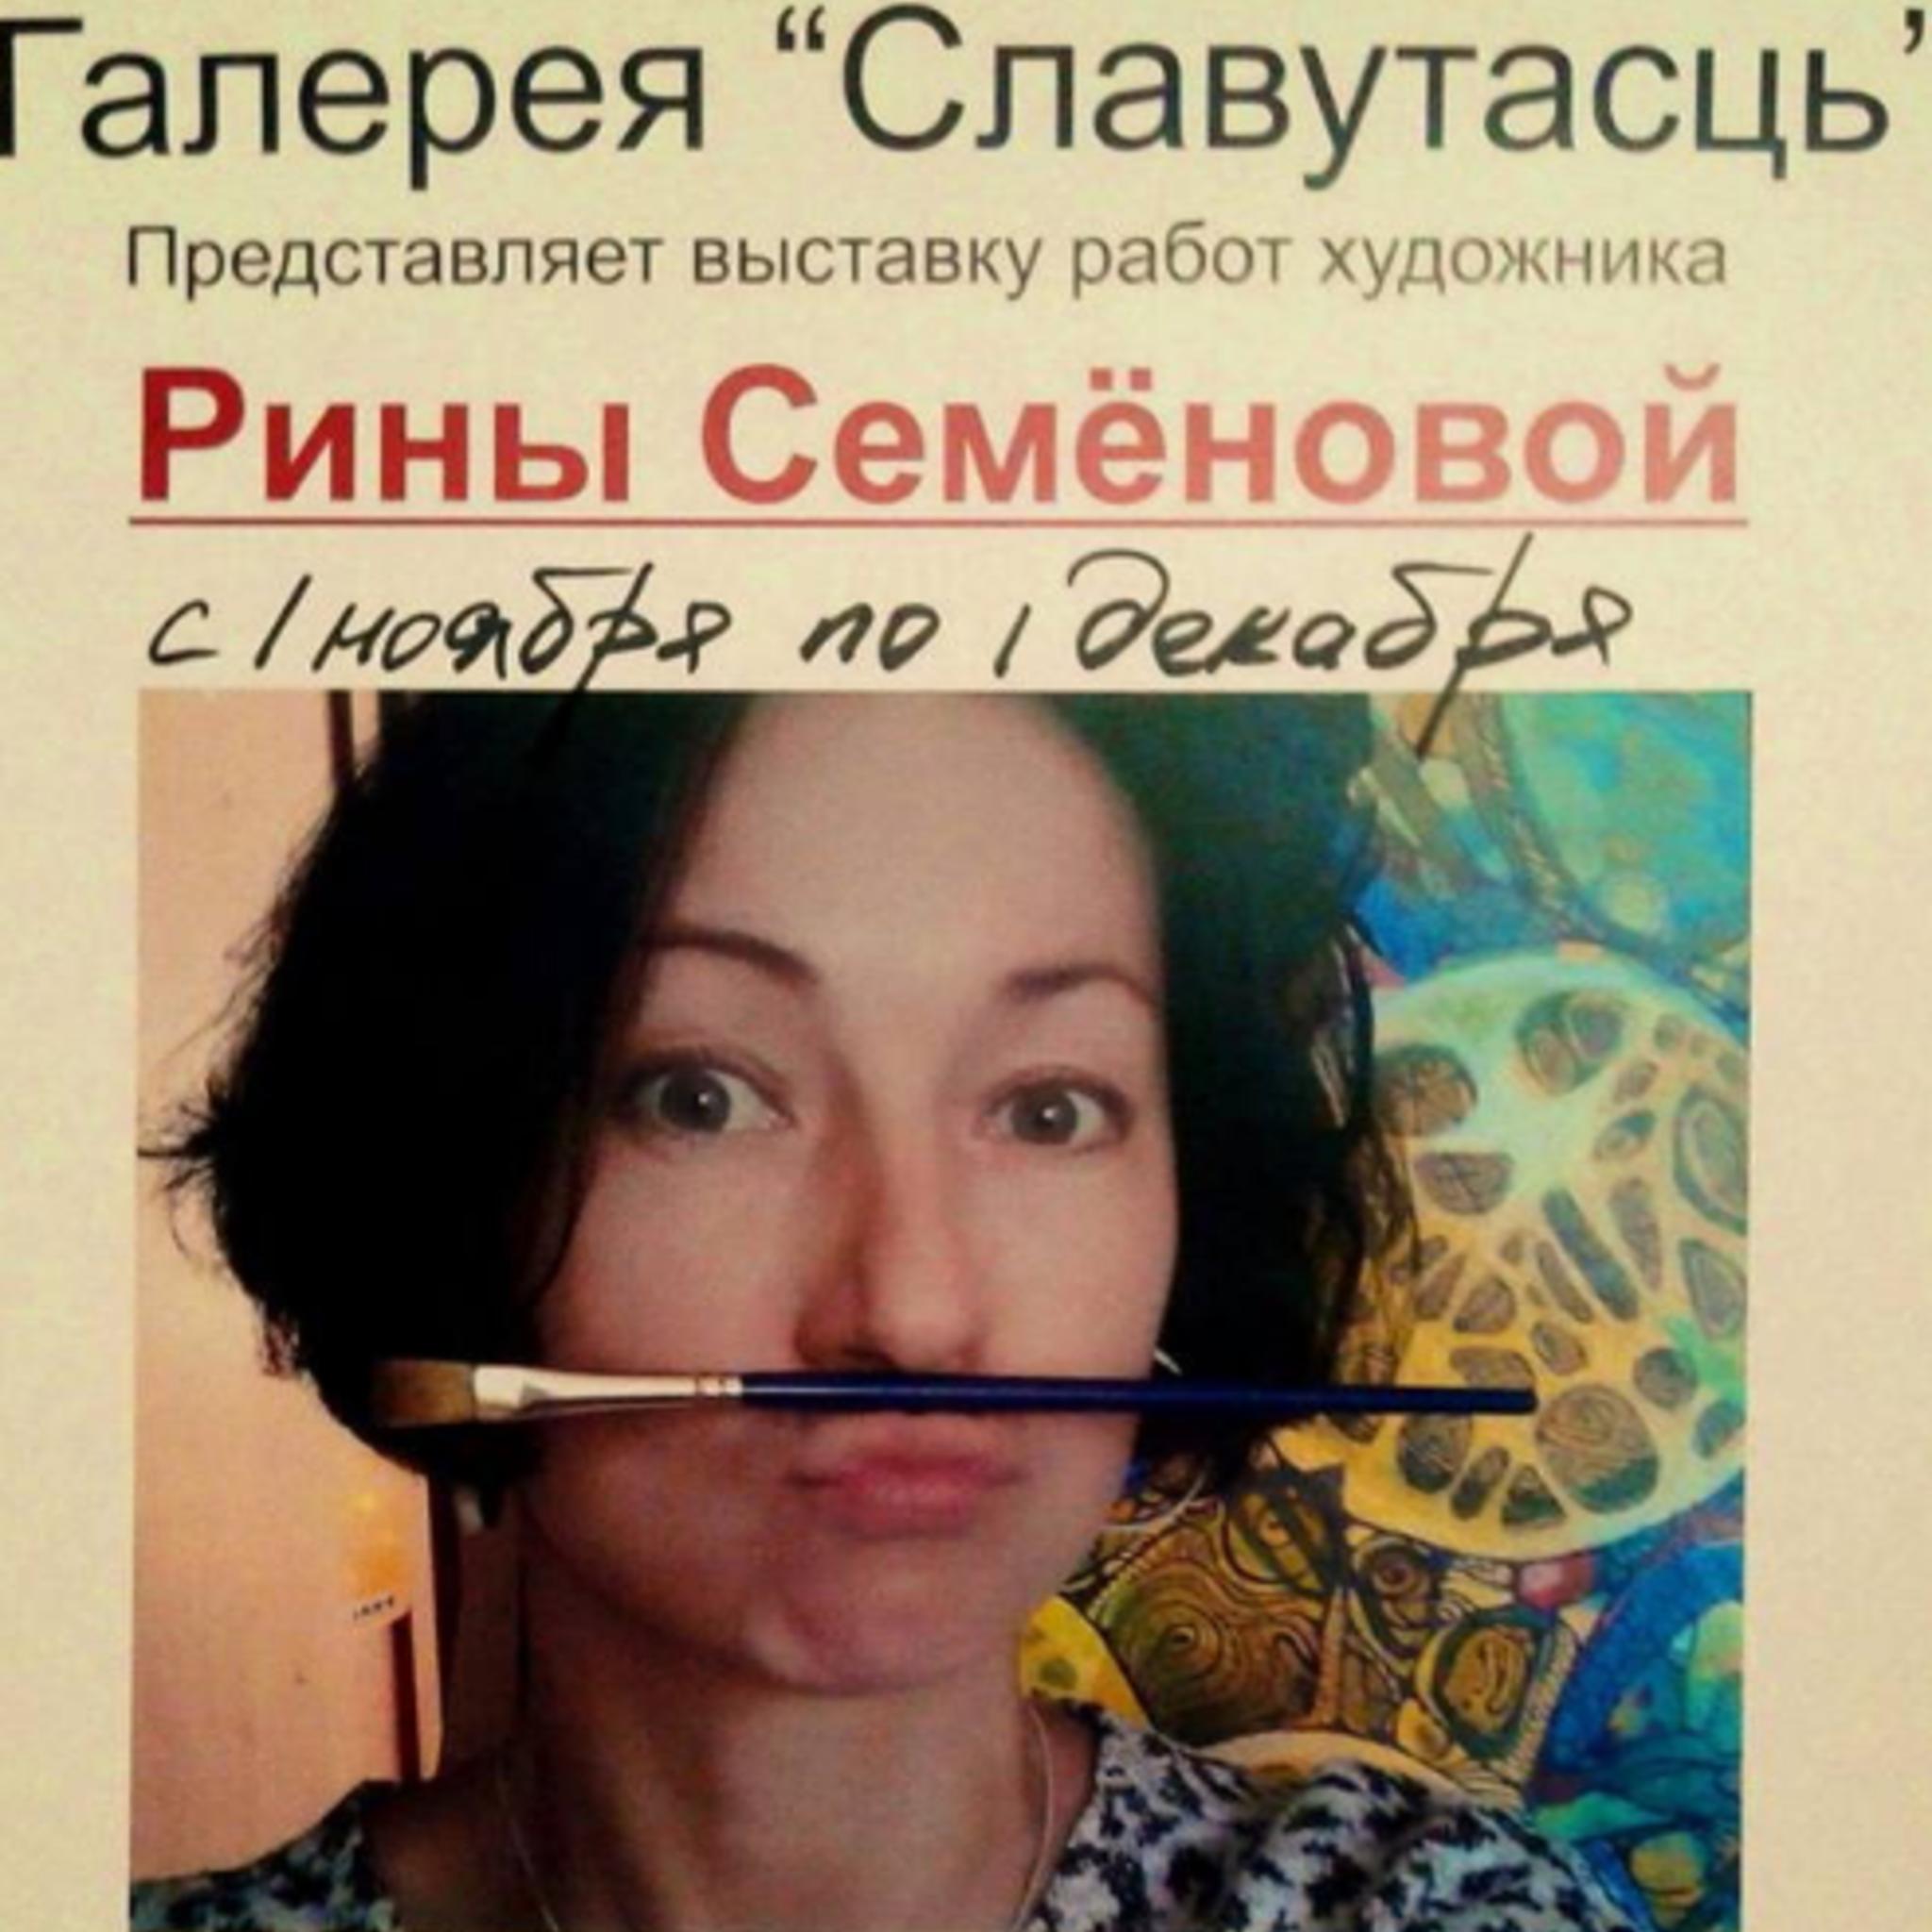 Irina Semenova exhibition Pictures – batteries